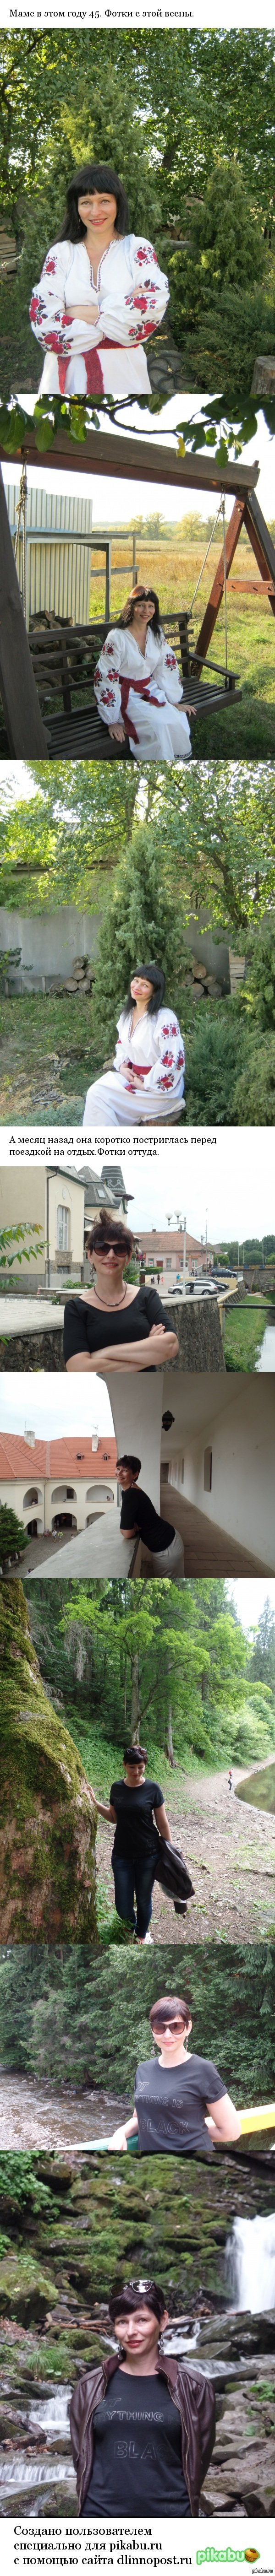 "Гордости пост В ответ на <a href=""http://pikabu.ru/story/v_ligu_molodo_vyigldyashchikh_3485090."">http://pikabu.ru/story/_3485090</a> П.с. В семье у нас три ребенка"